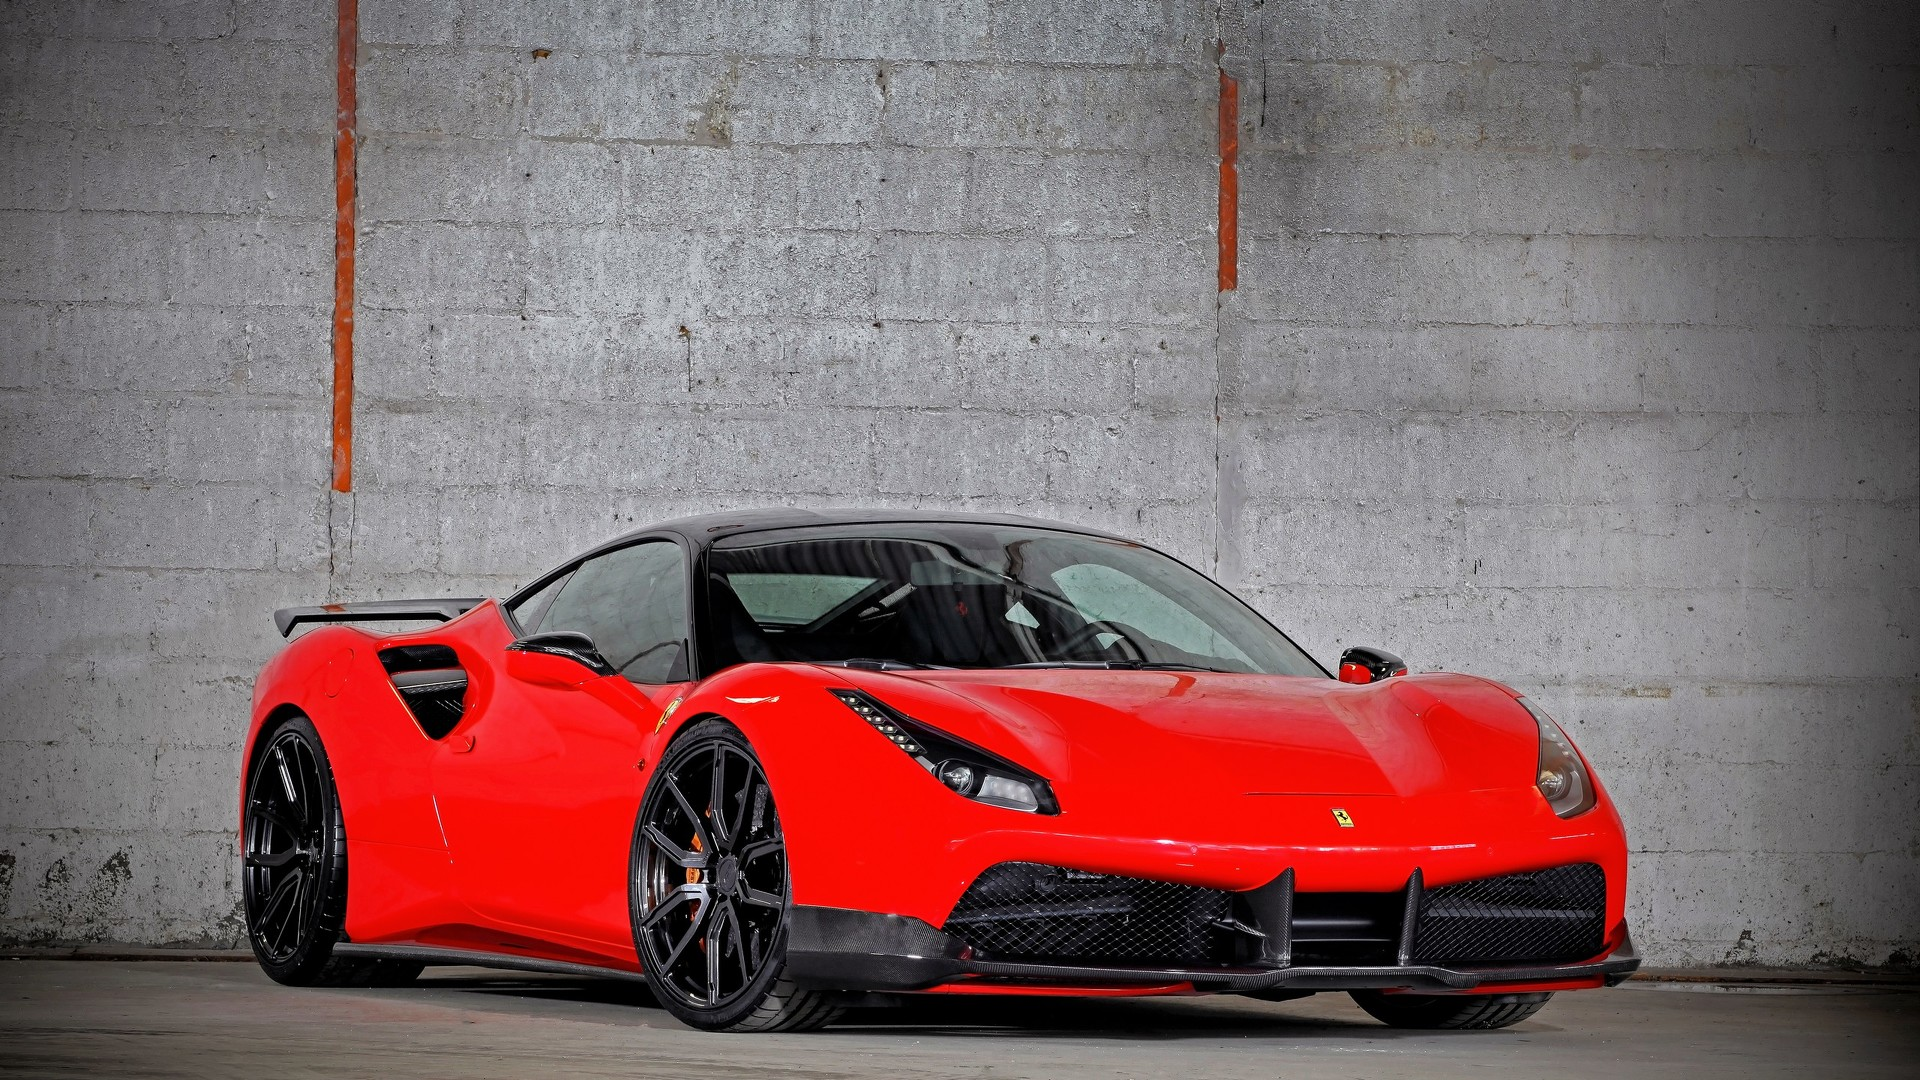 Tuner's 900-hp Ferrari 488 GTB looks devilish